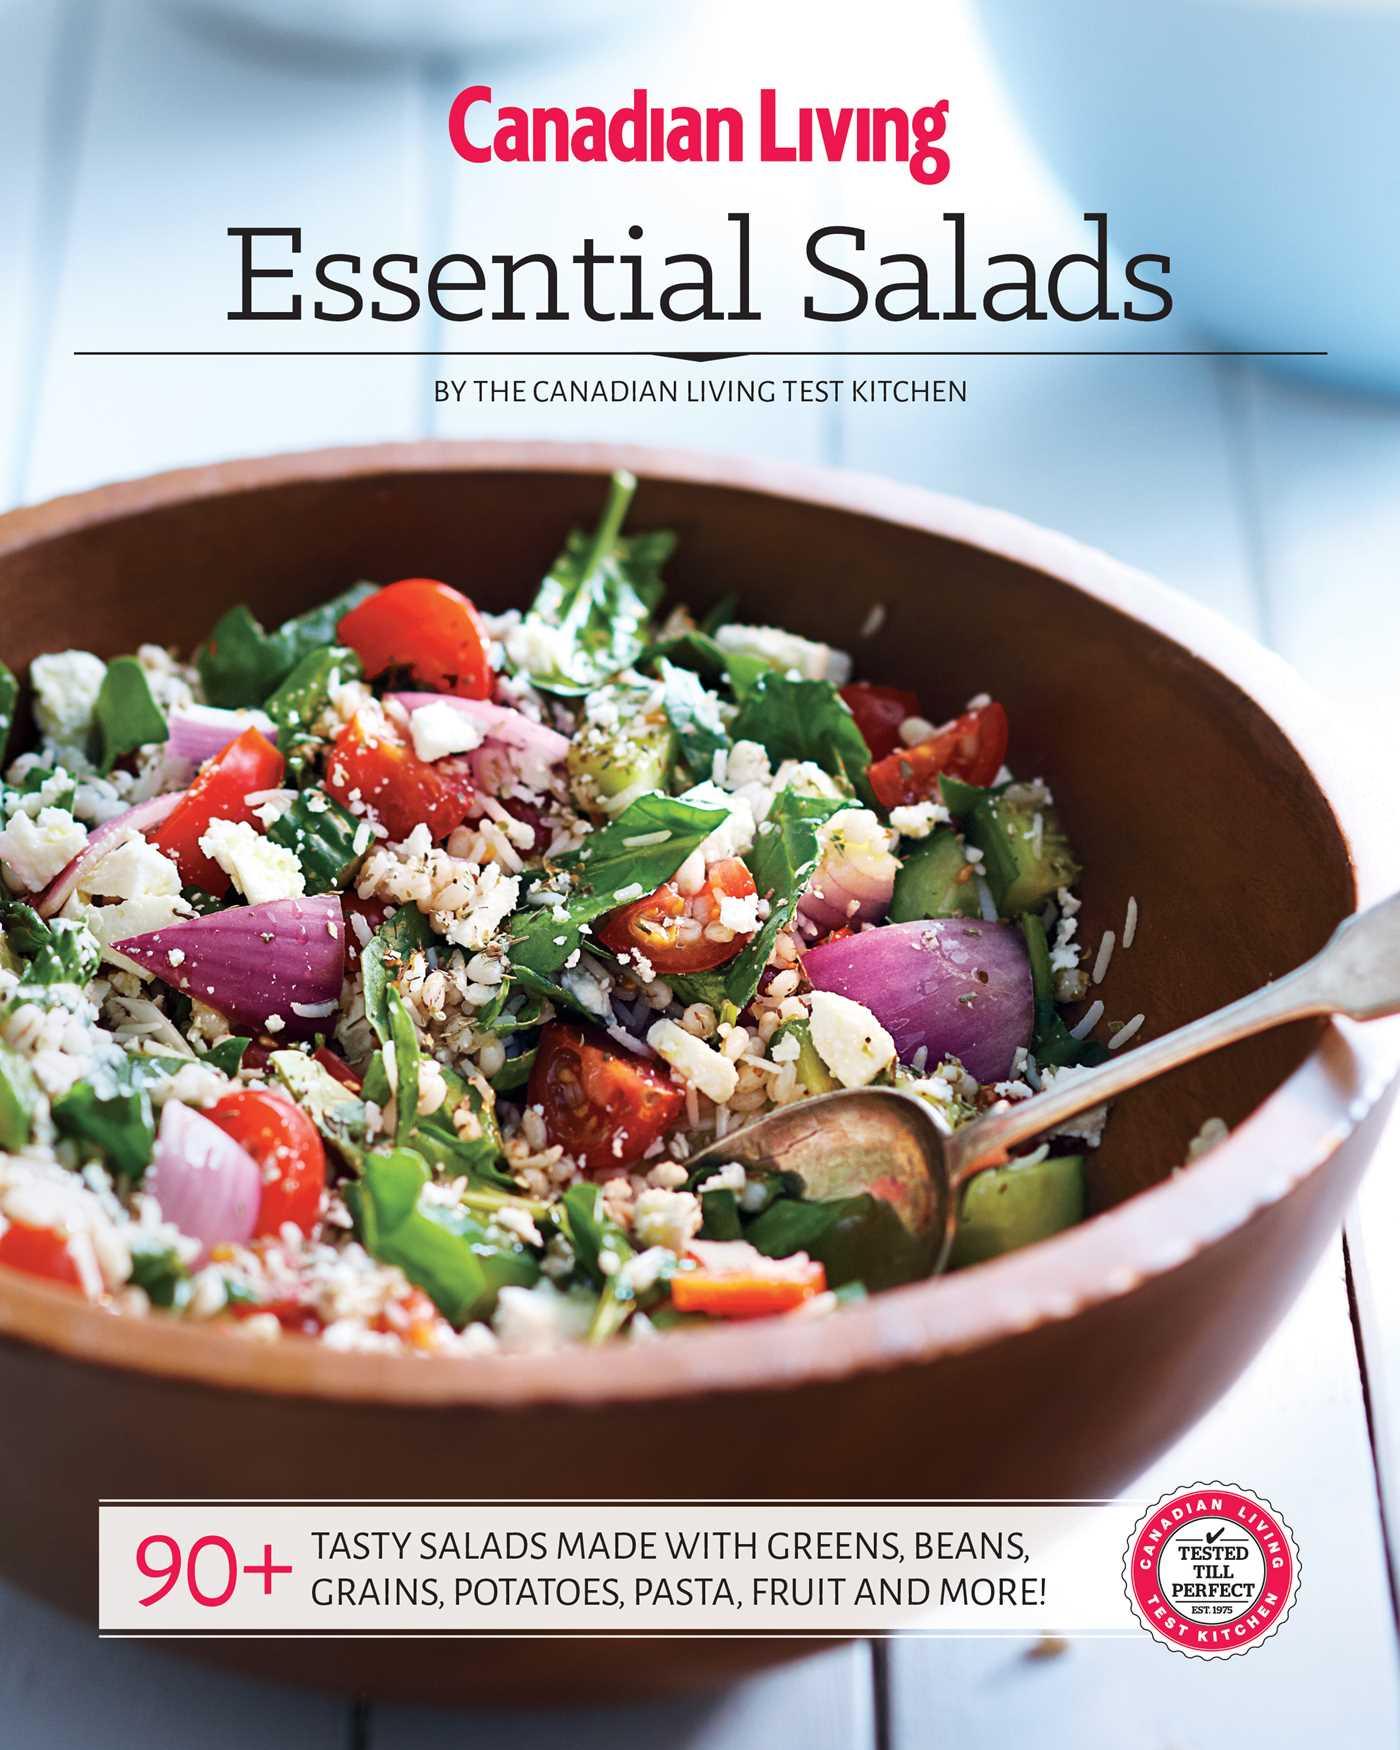 Canadian Living: Essential Salads